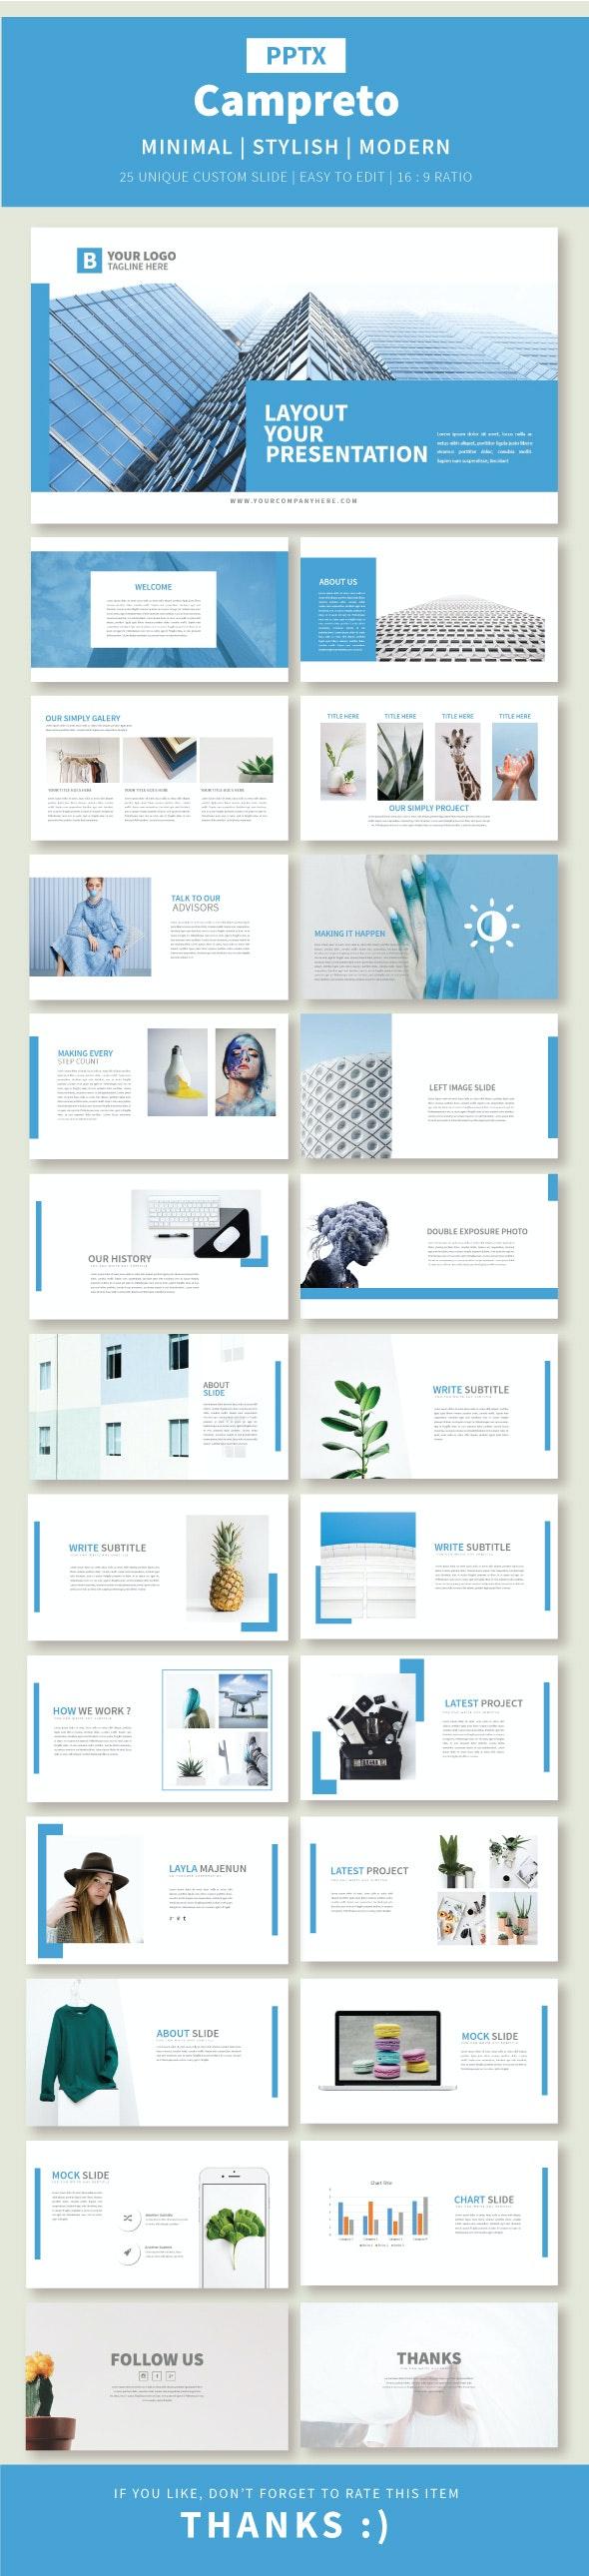 Campreto Presentation Template - Business PowerPoint Templates